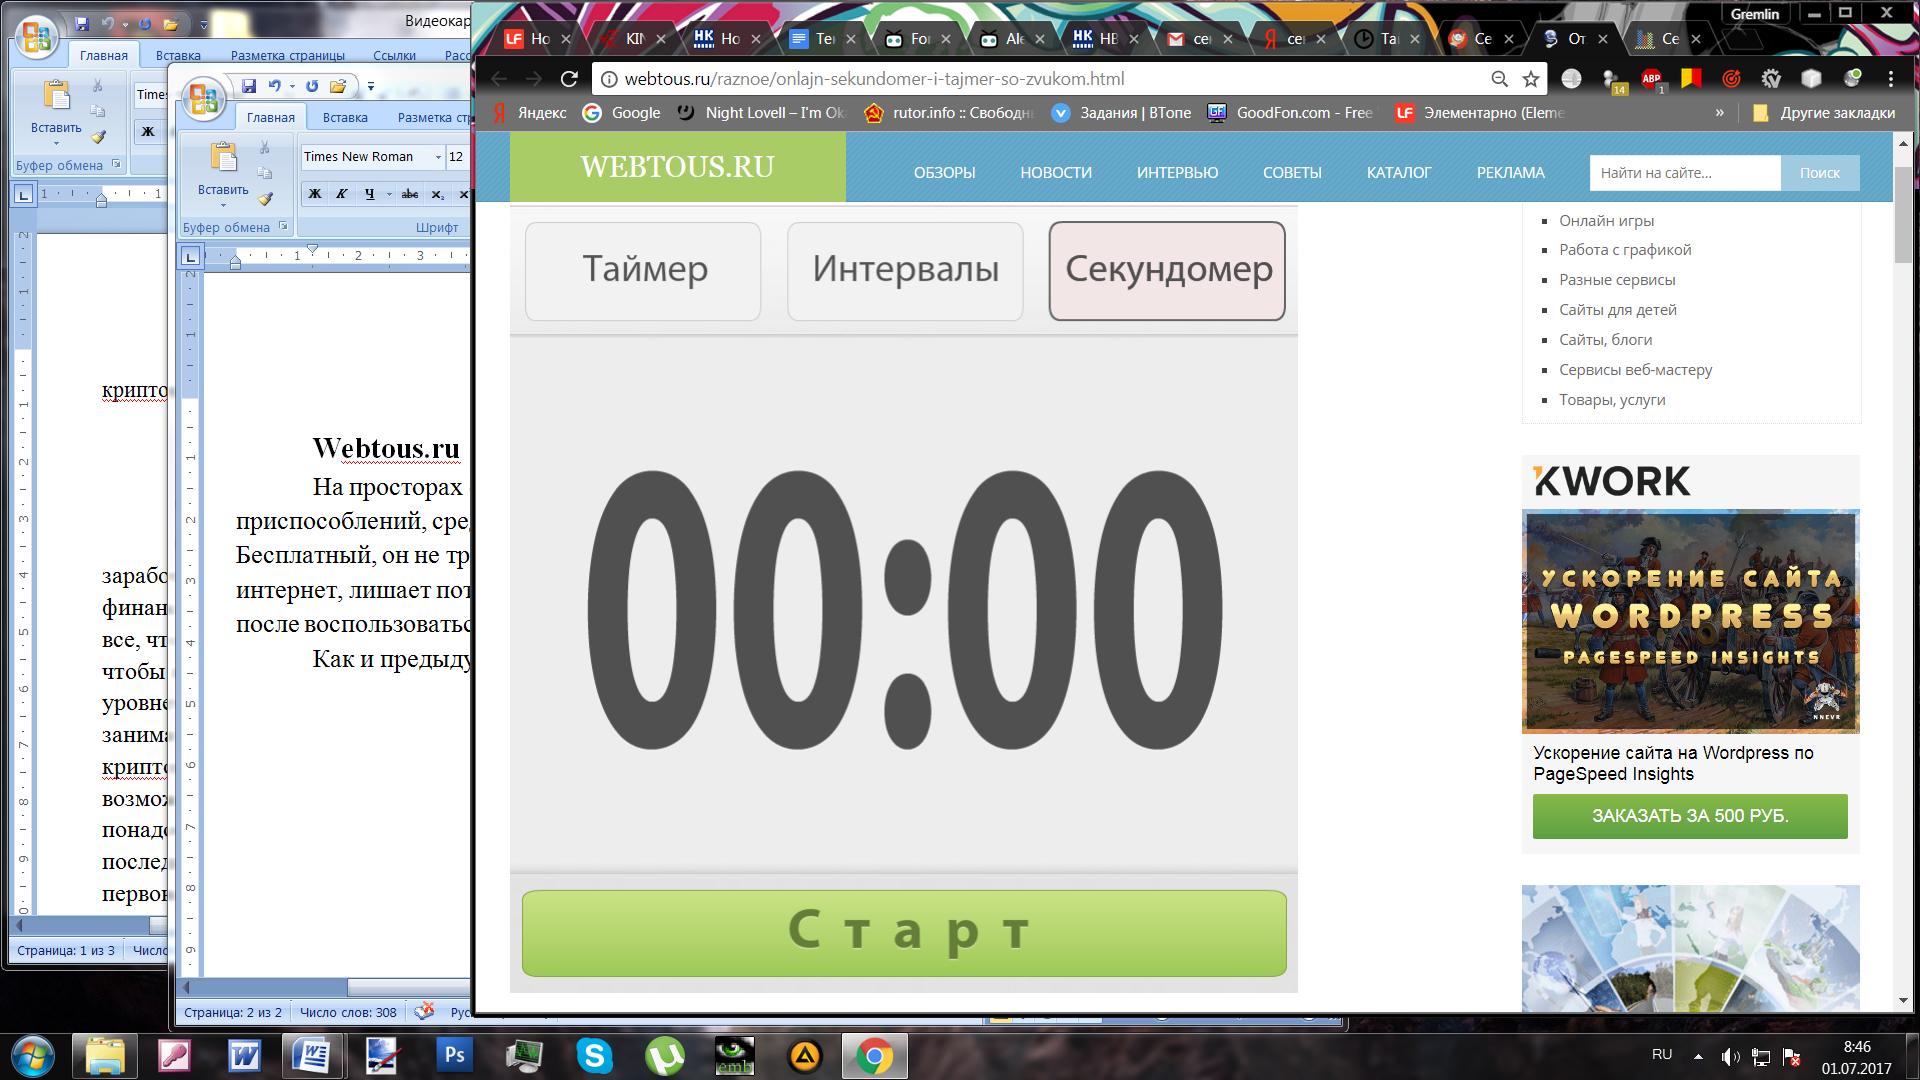 Сервис Webtous.ru